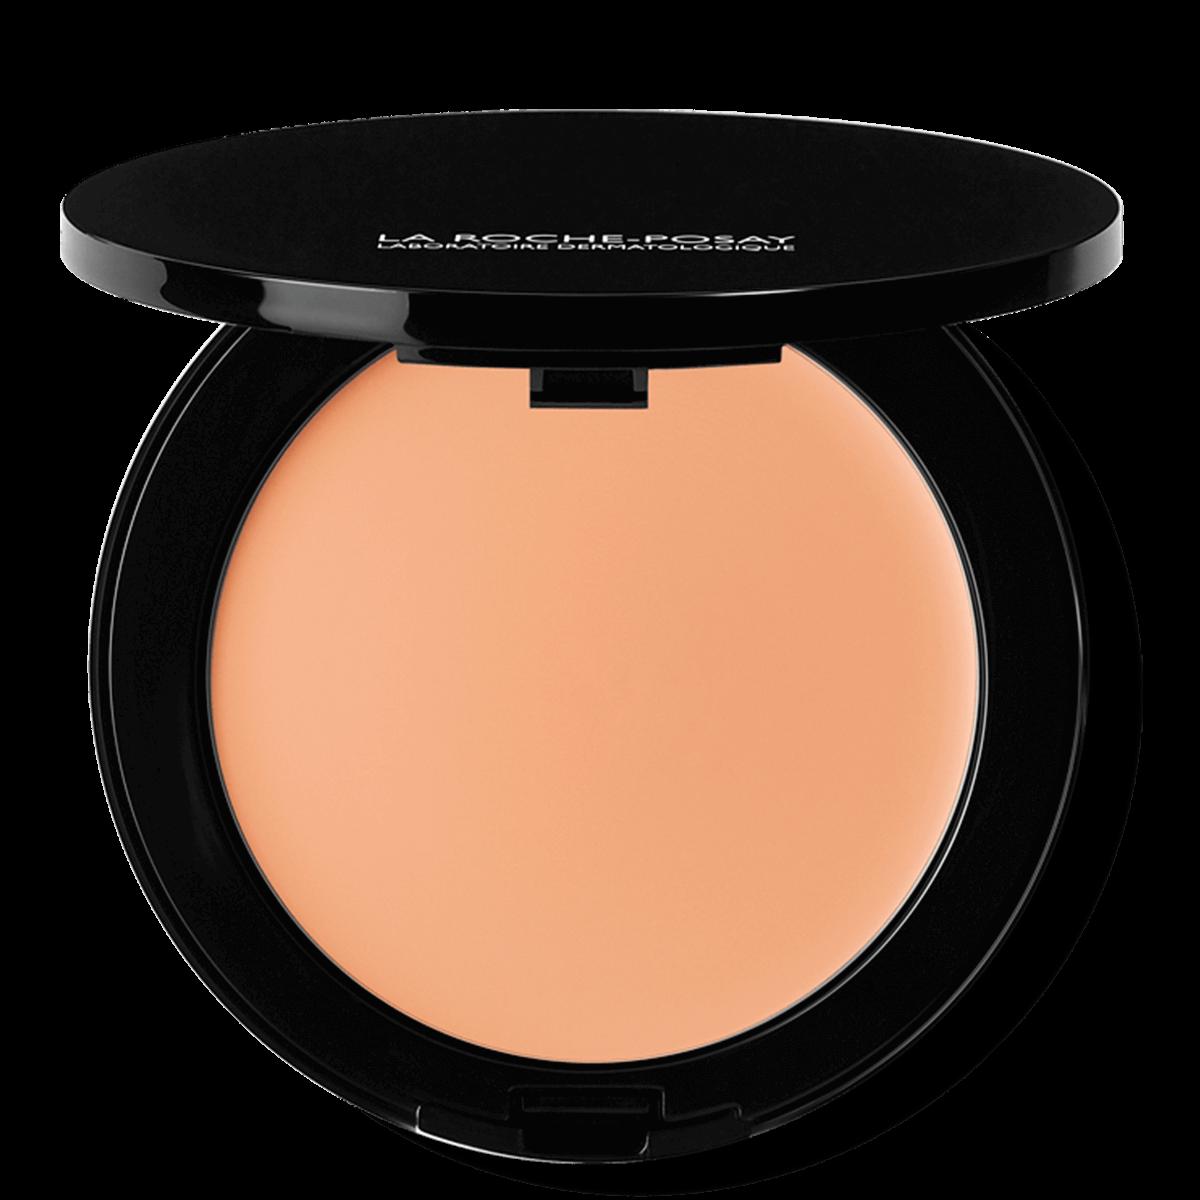 La Roche Posay Känslig Toleriane Make up COMPACT CREAM 11LightBeige